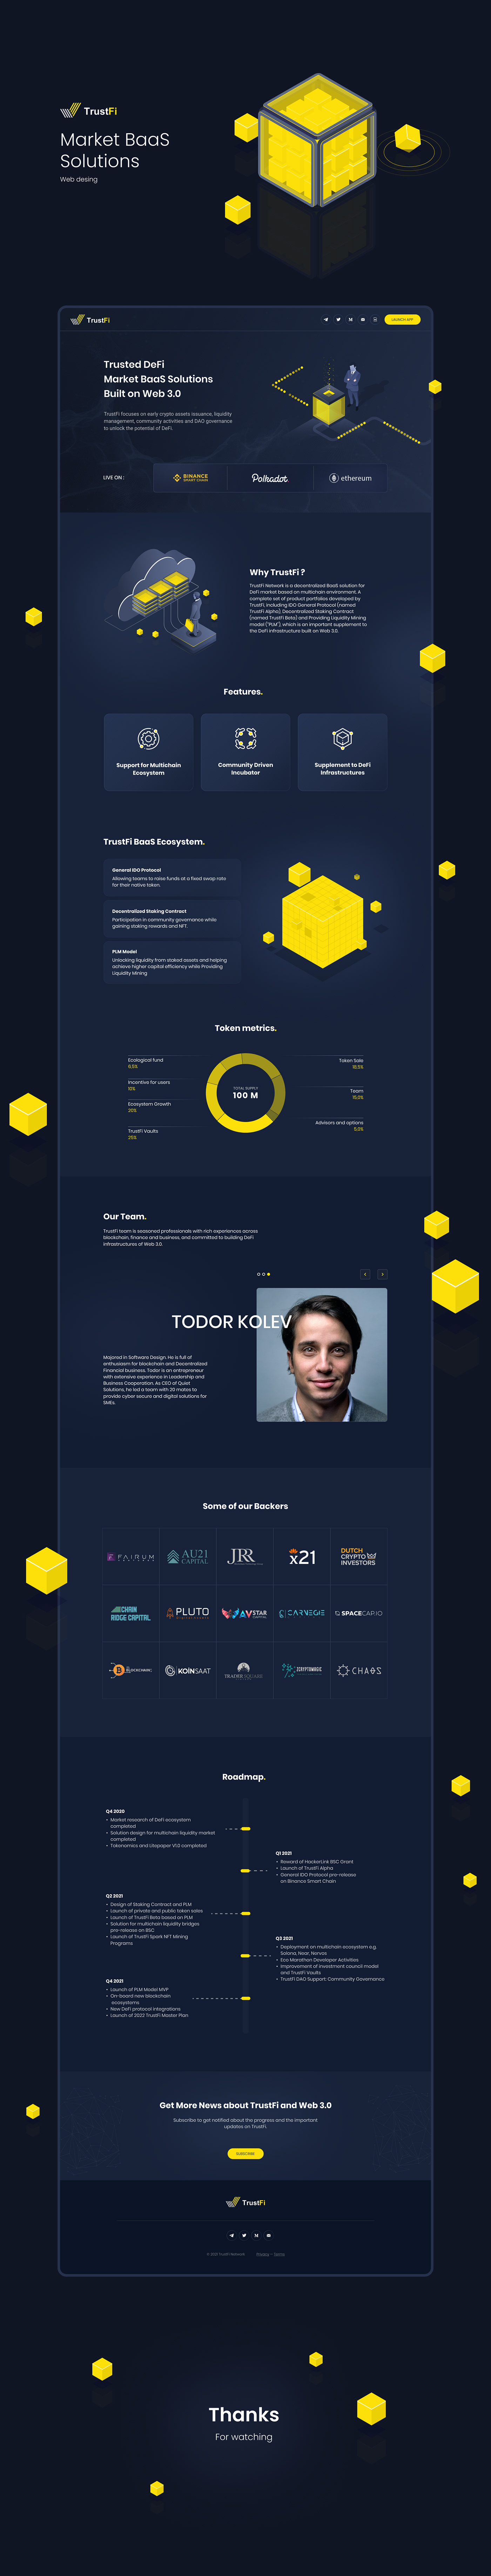 Figma graphicdesign landingpage UI ux Webdesign